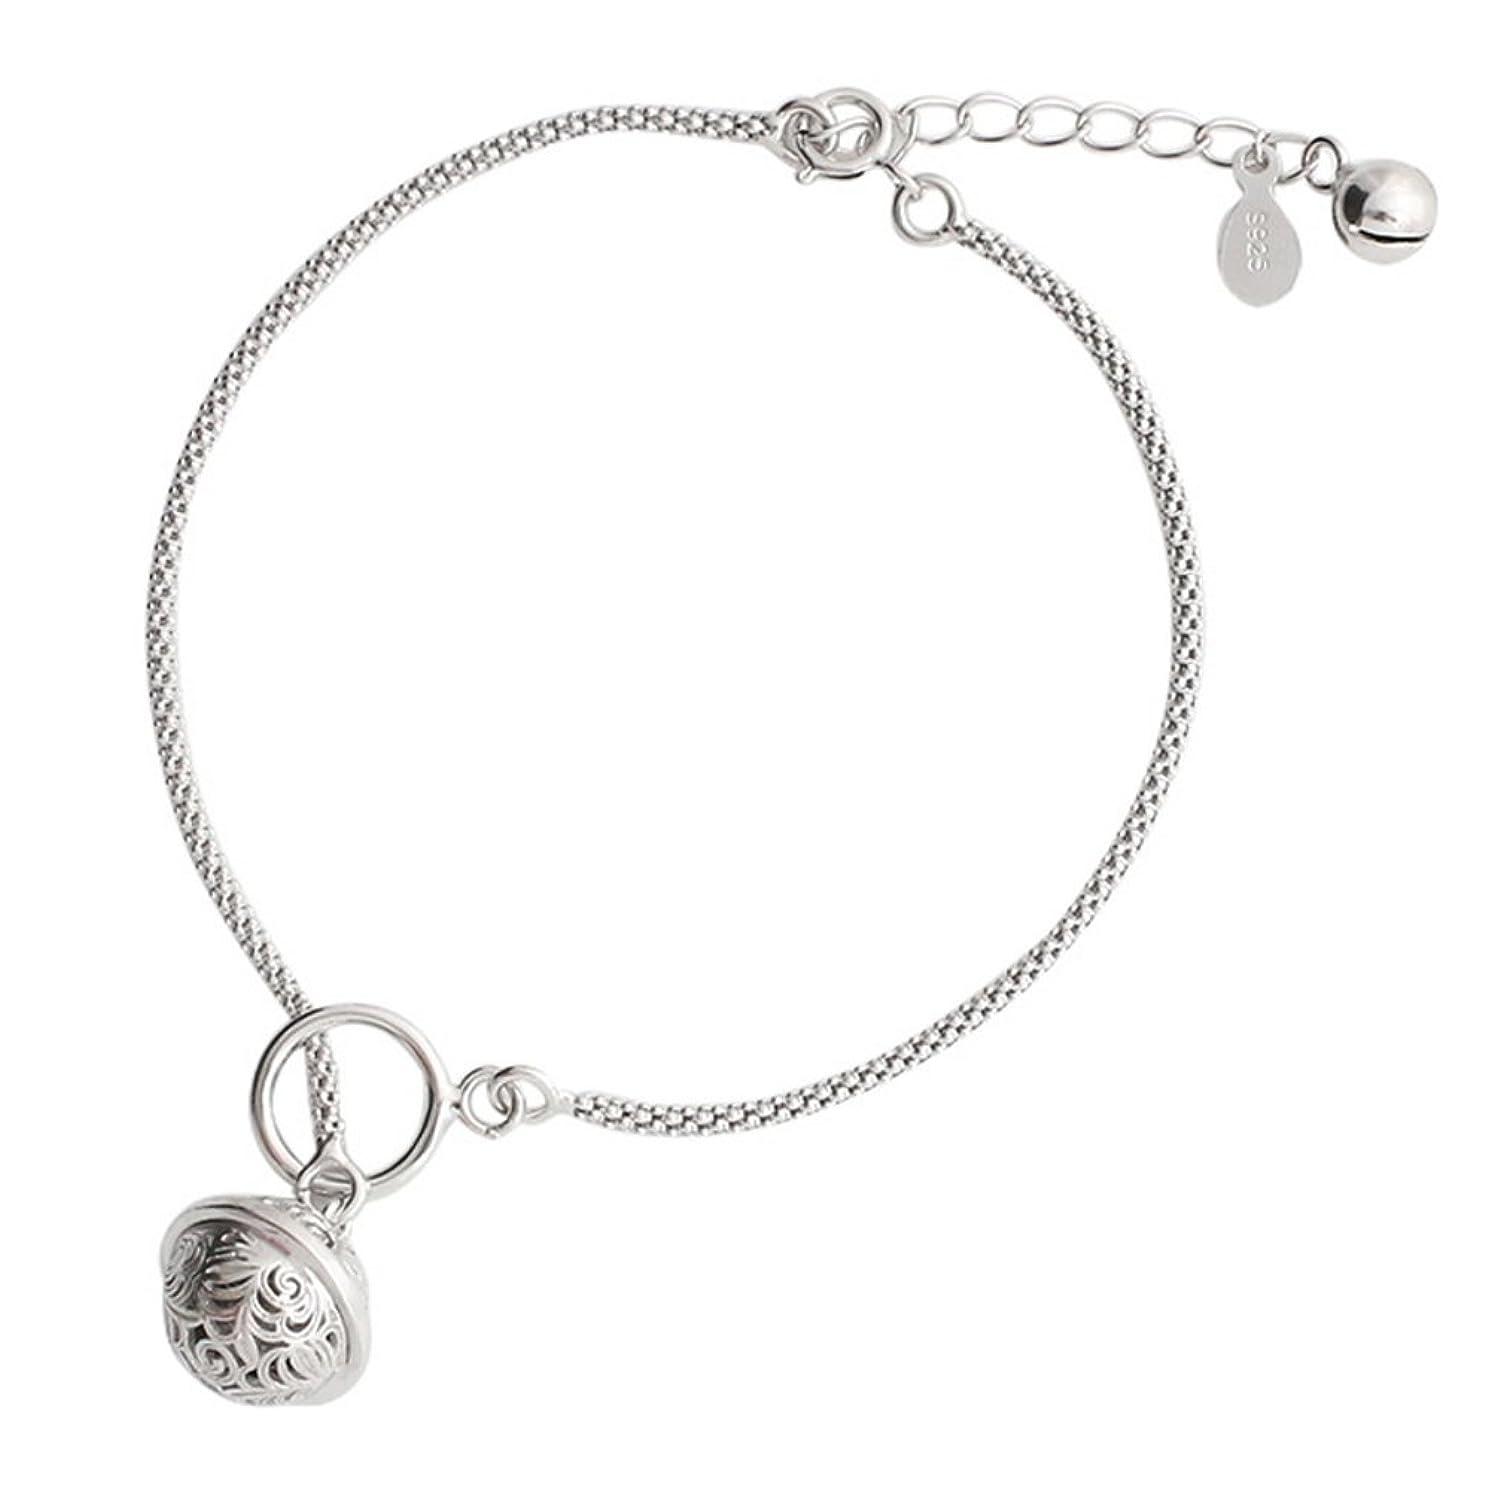 Helen de Lete Simple Style Vintage Tinkle Bell Fashion Sterling Silver Anklet